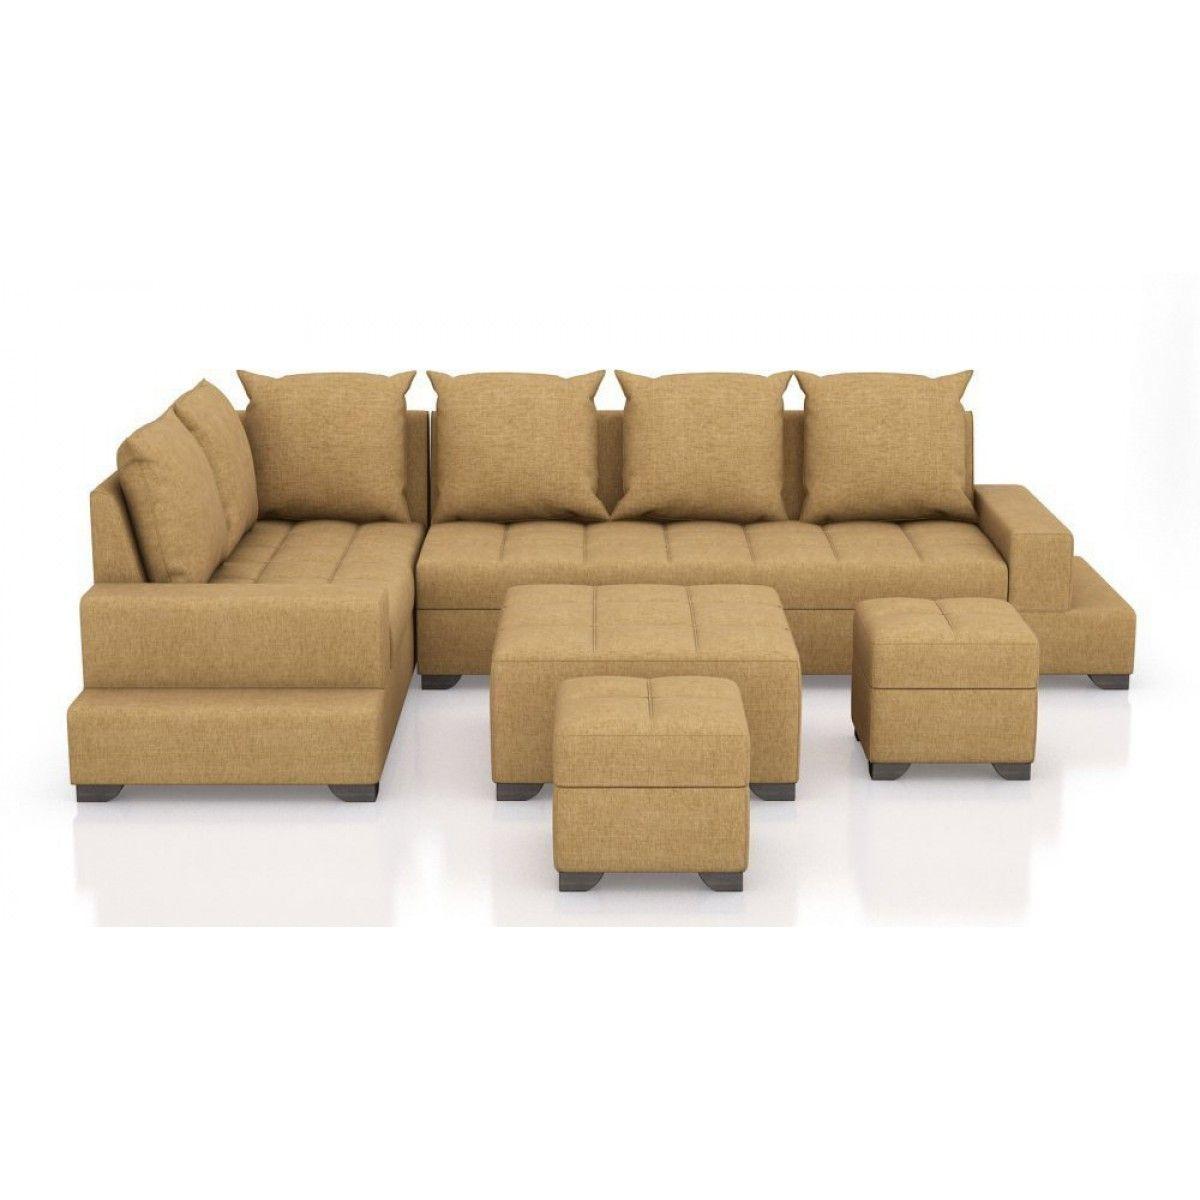 Best Gorevizon Sofa Set Online Shopping Fluffy Cushioned 400 x 300